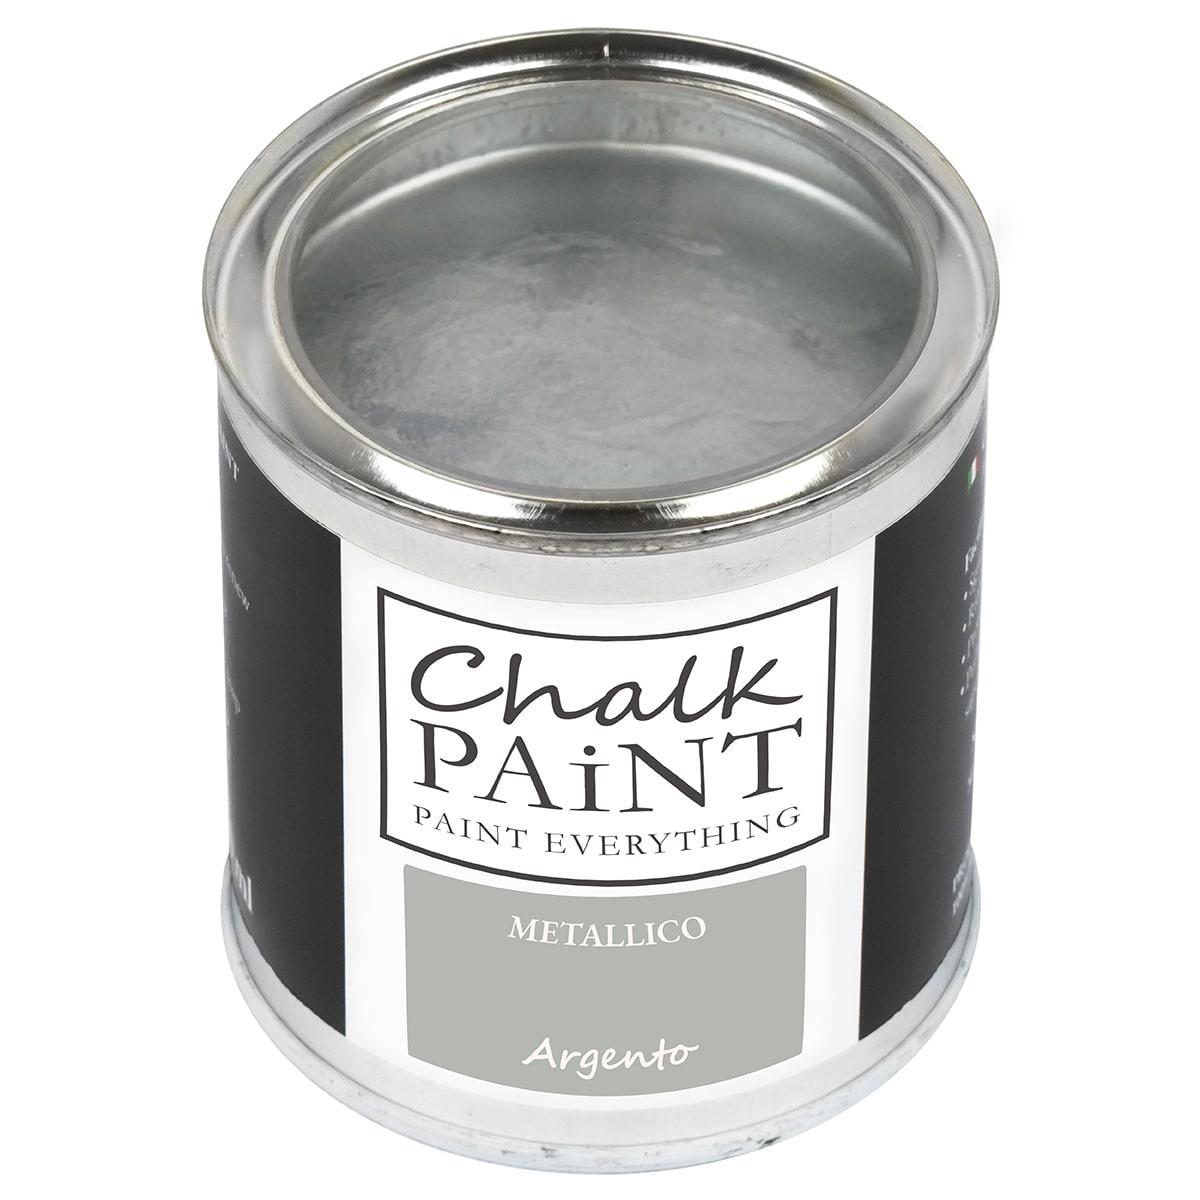 Vernice metallica ARGENTO decora facile con questa paint magic